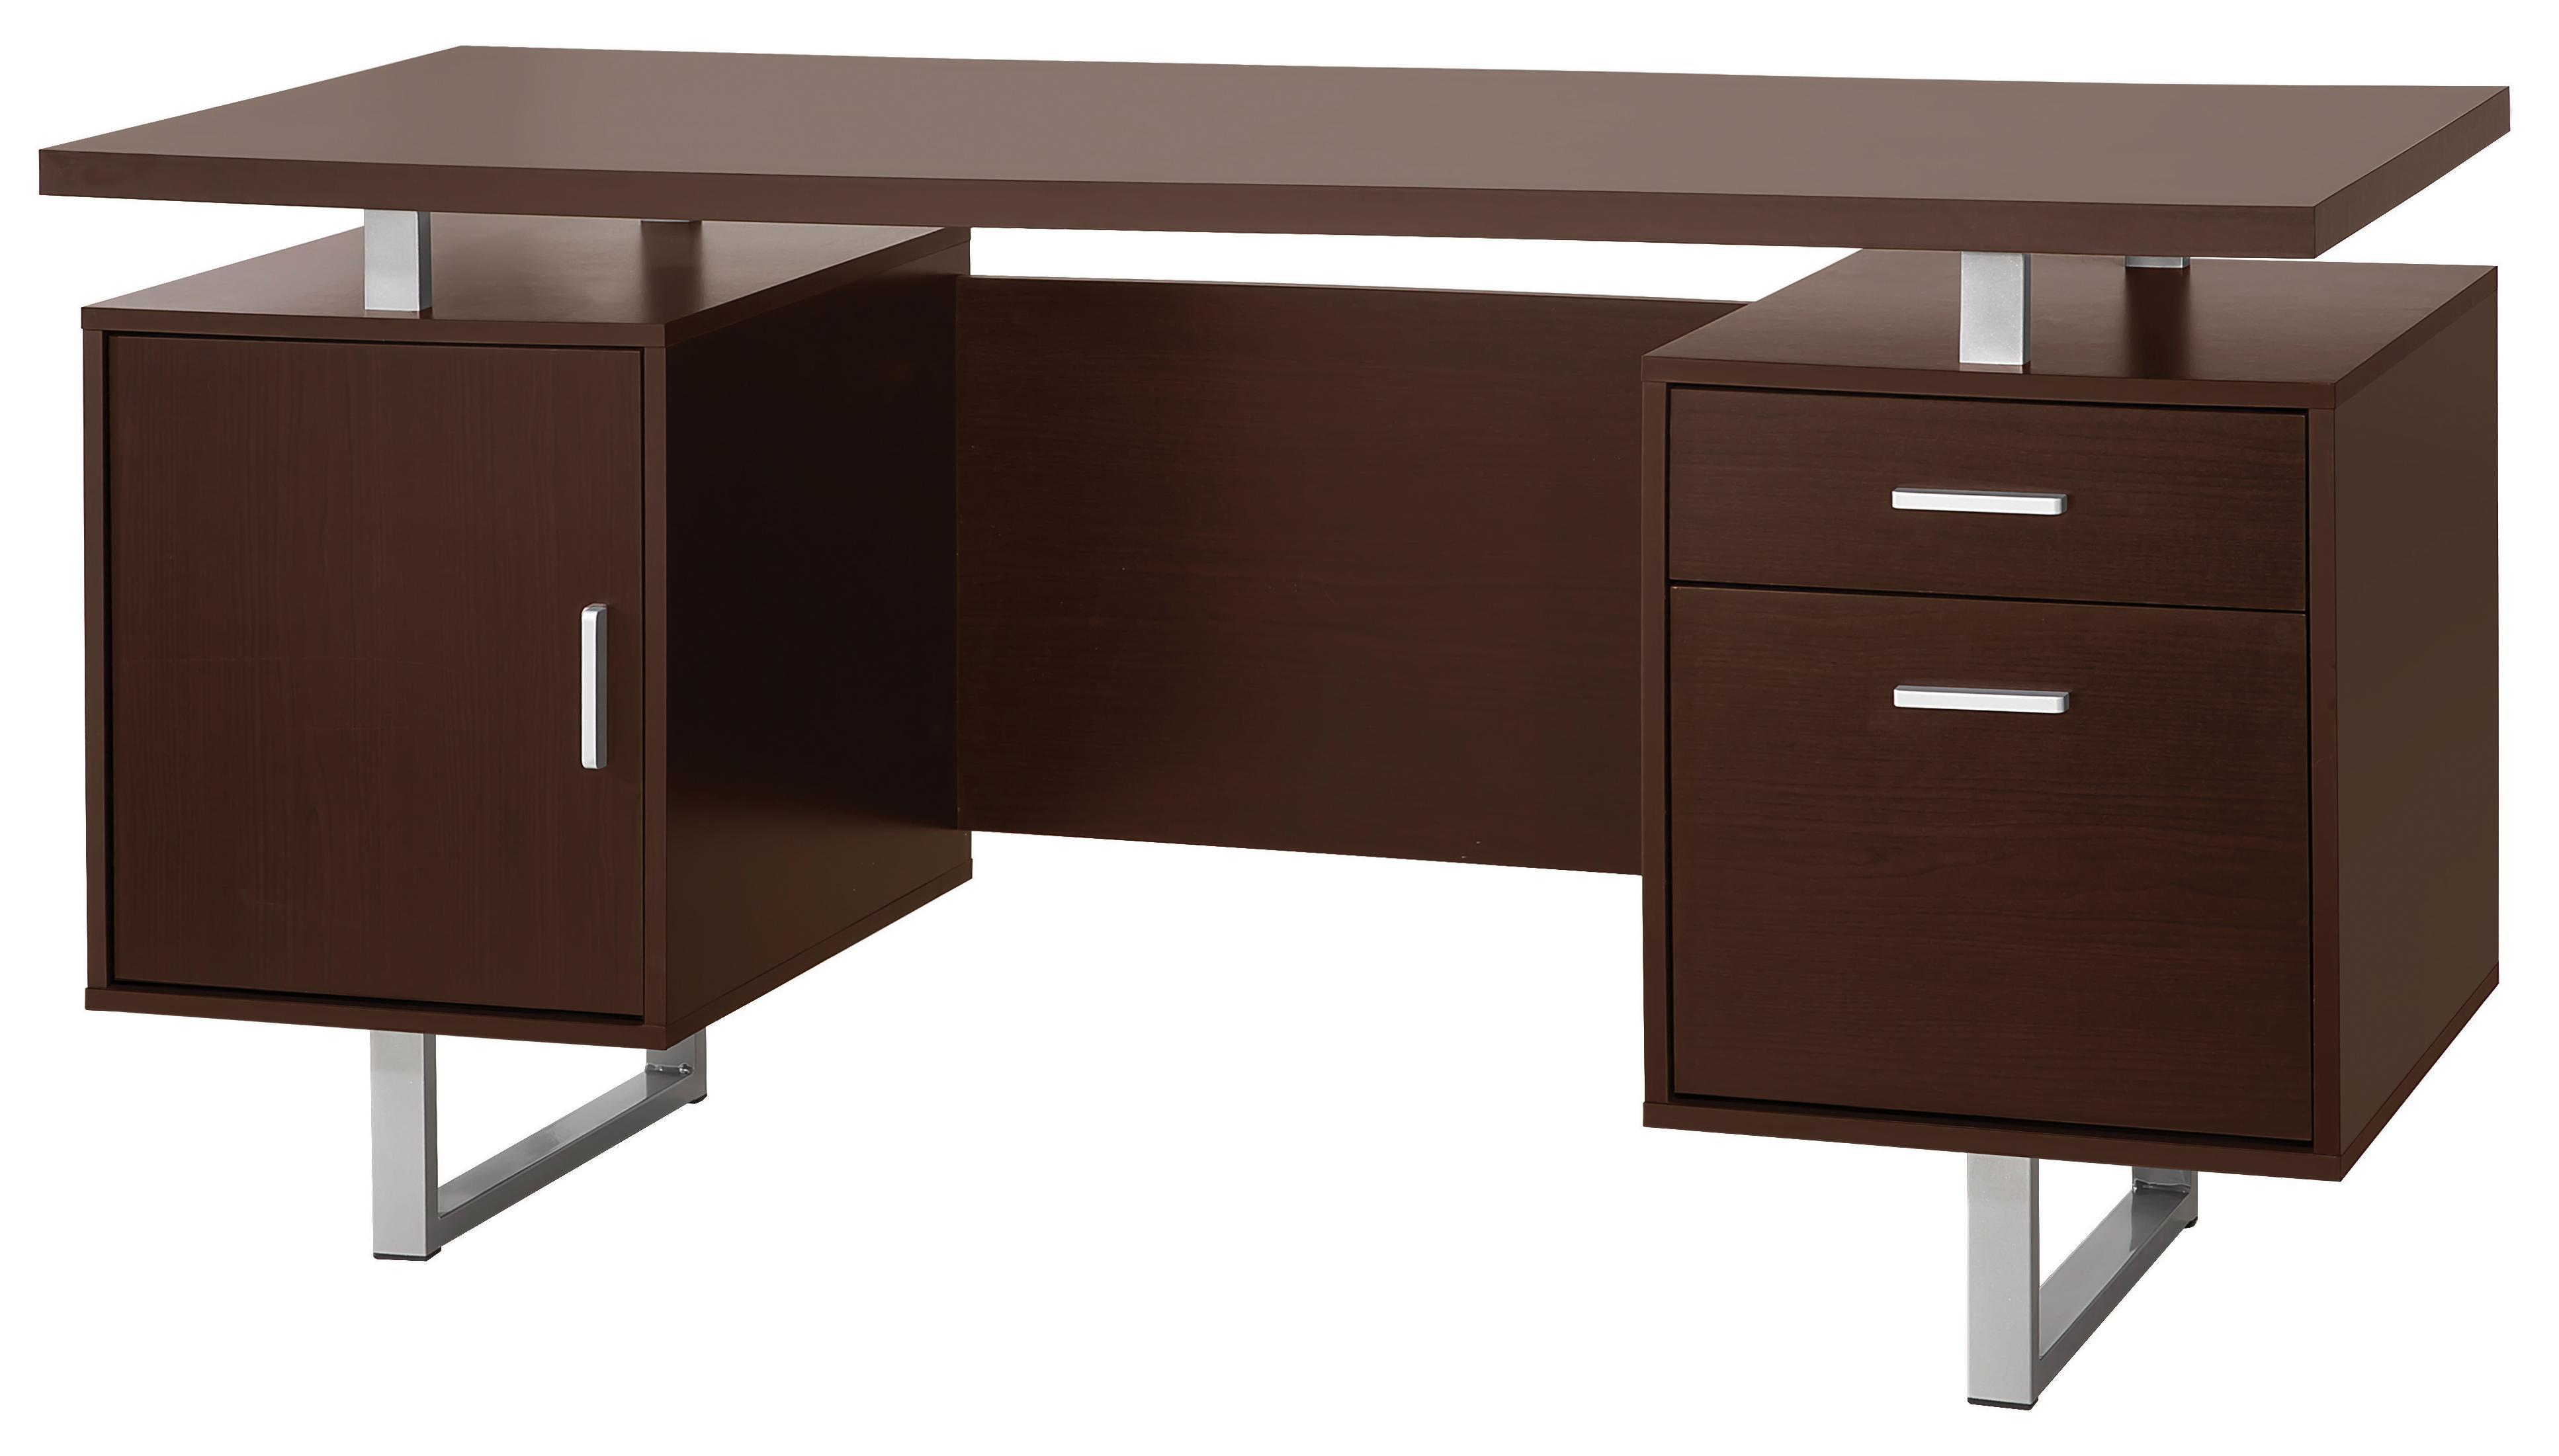 Glavan Office Desk by Coaster at Value City Furniture